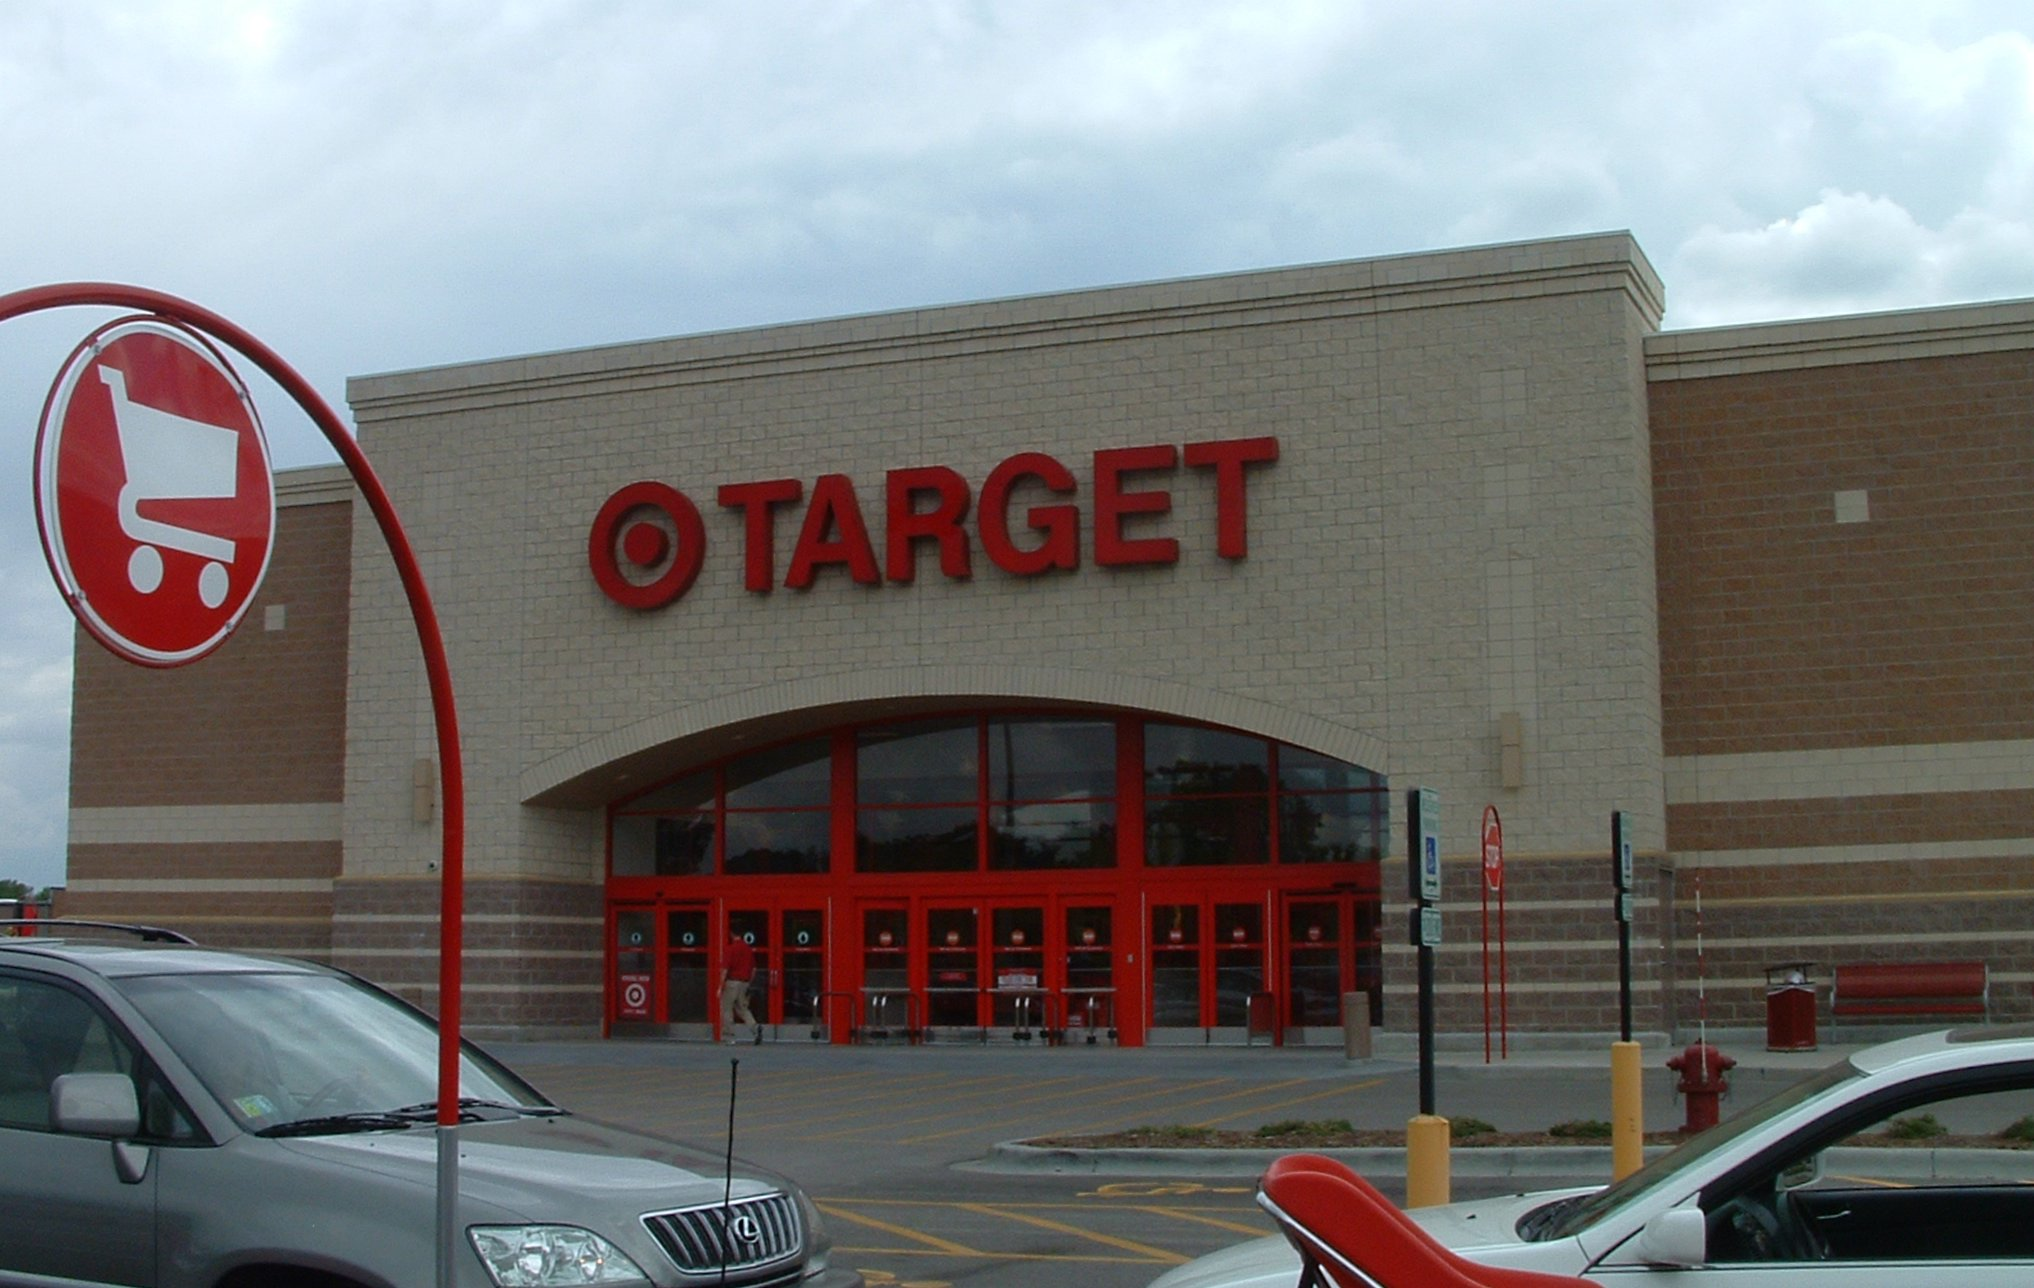 File:Illinois Target Store.jpg - Wikimedia Commons